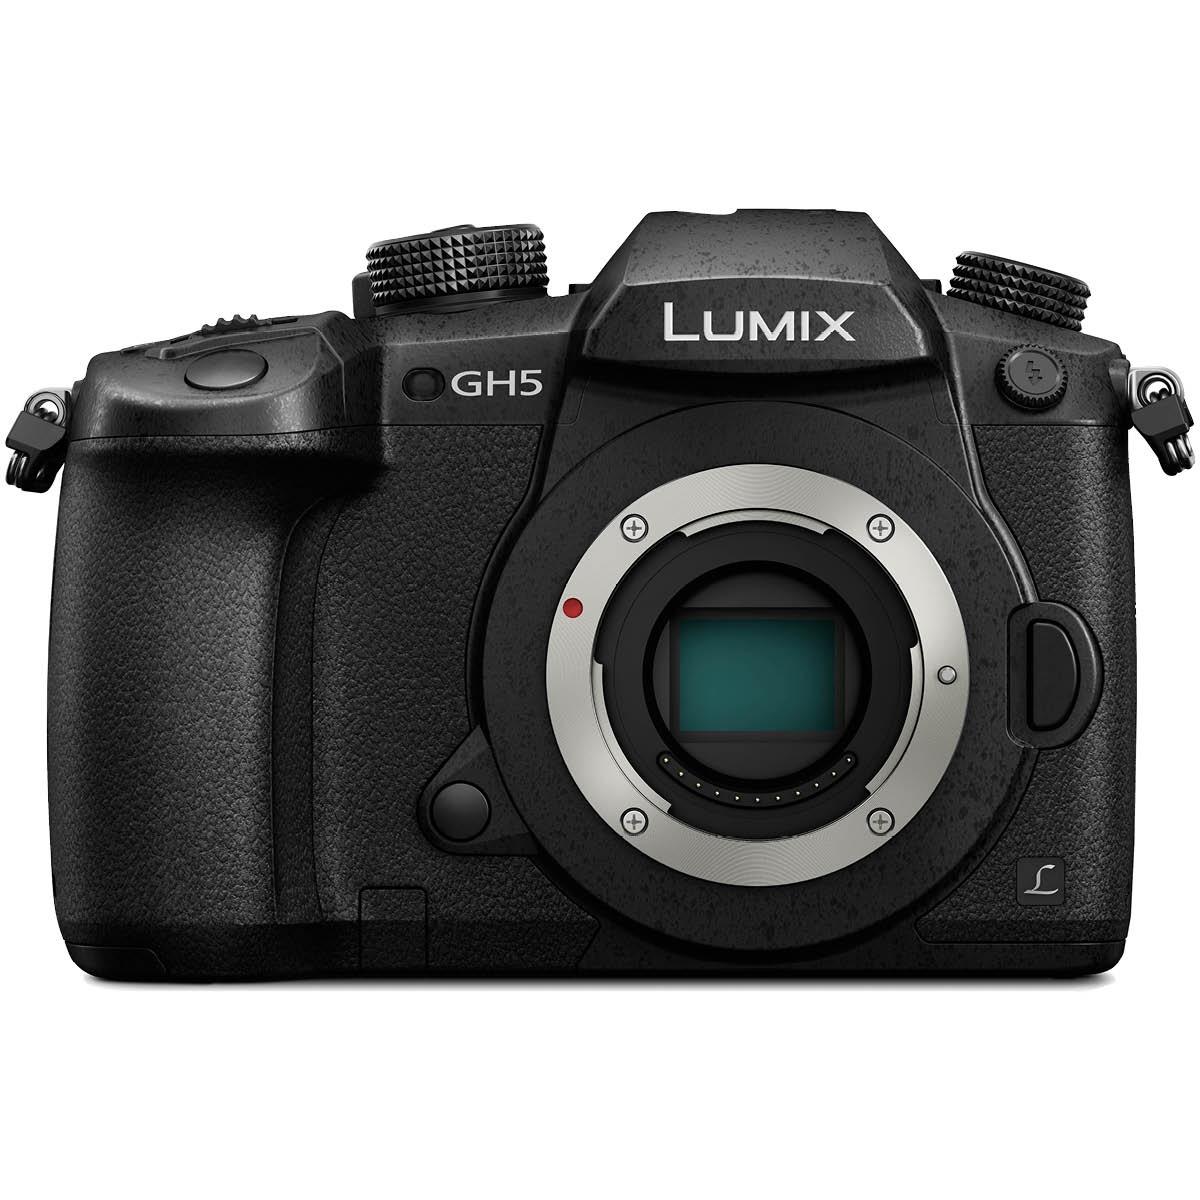 Panasonic Lumix DC - GH5 + DMW-BLK 22 E Akku + DJI Ronin SC Gimbal eff. 1299,--